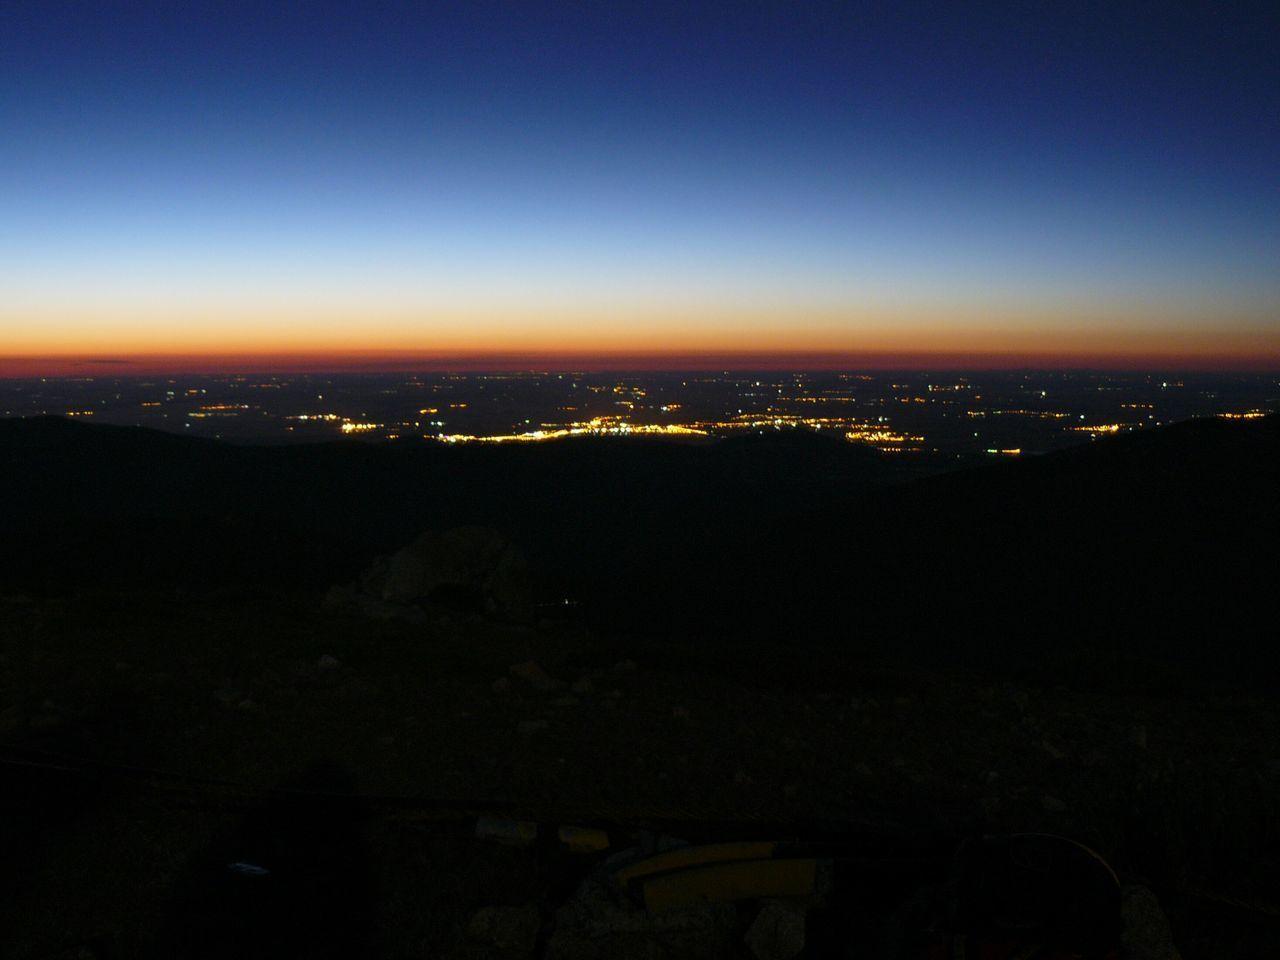 Sky Night Lights City SPAIN Cities At Night Overnight Success